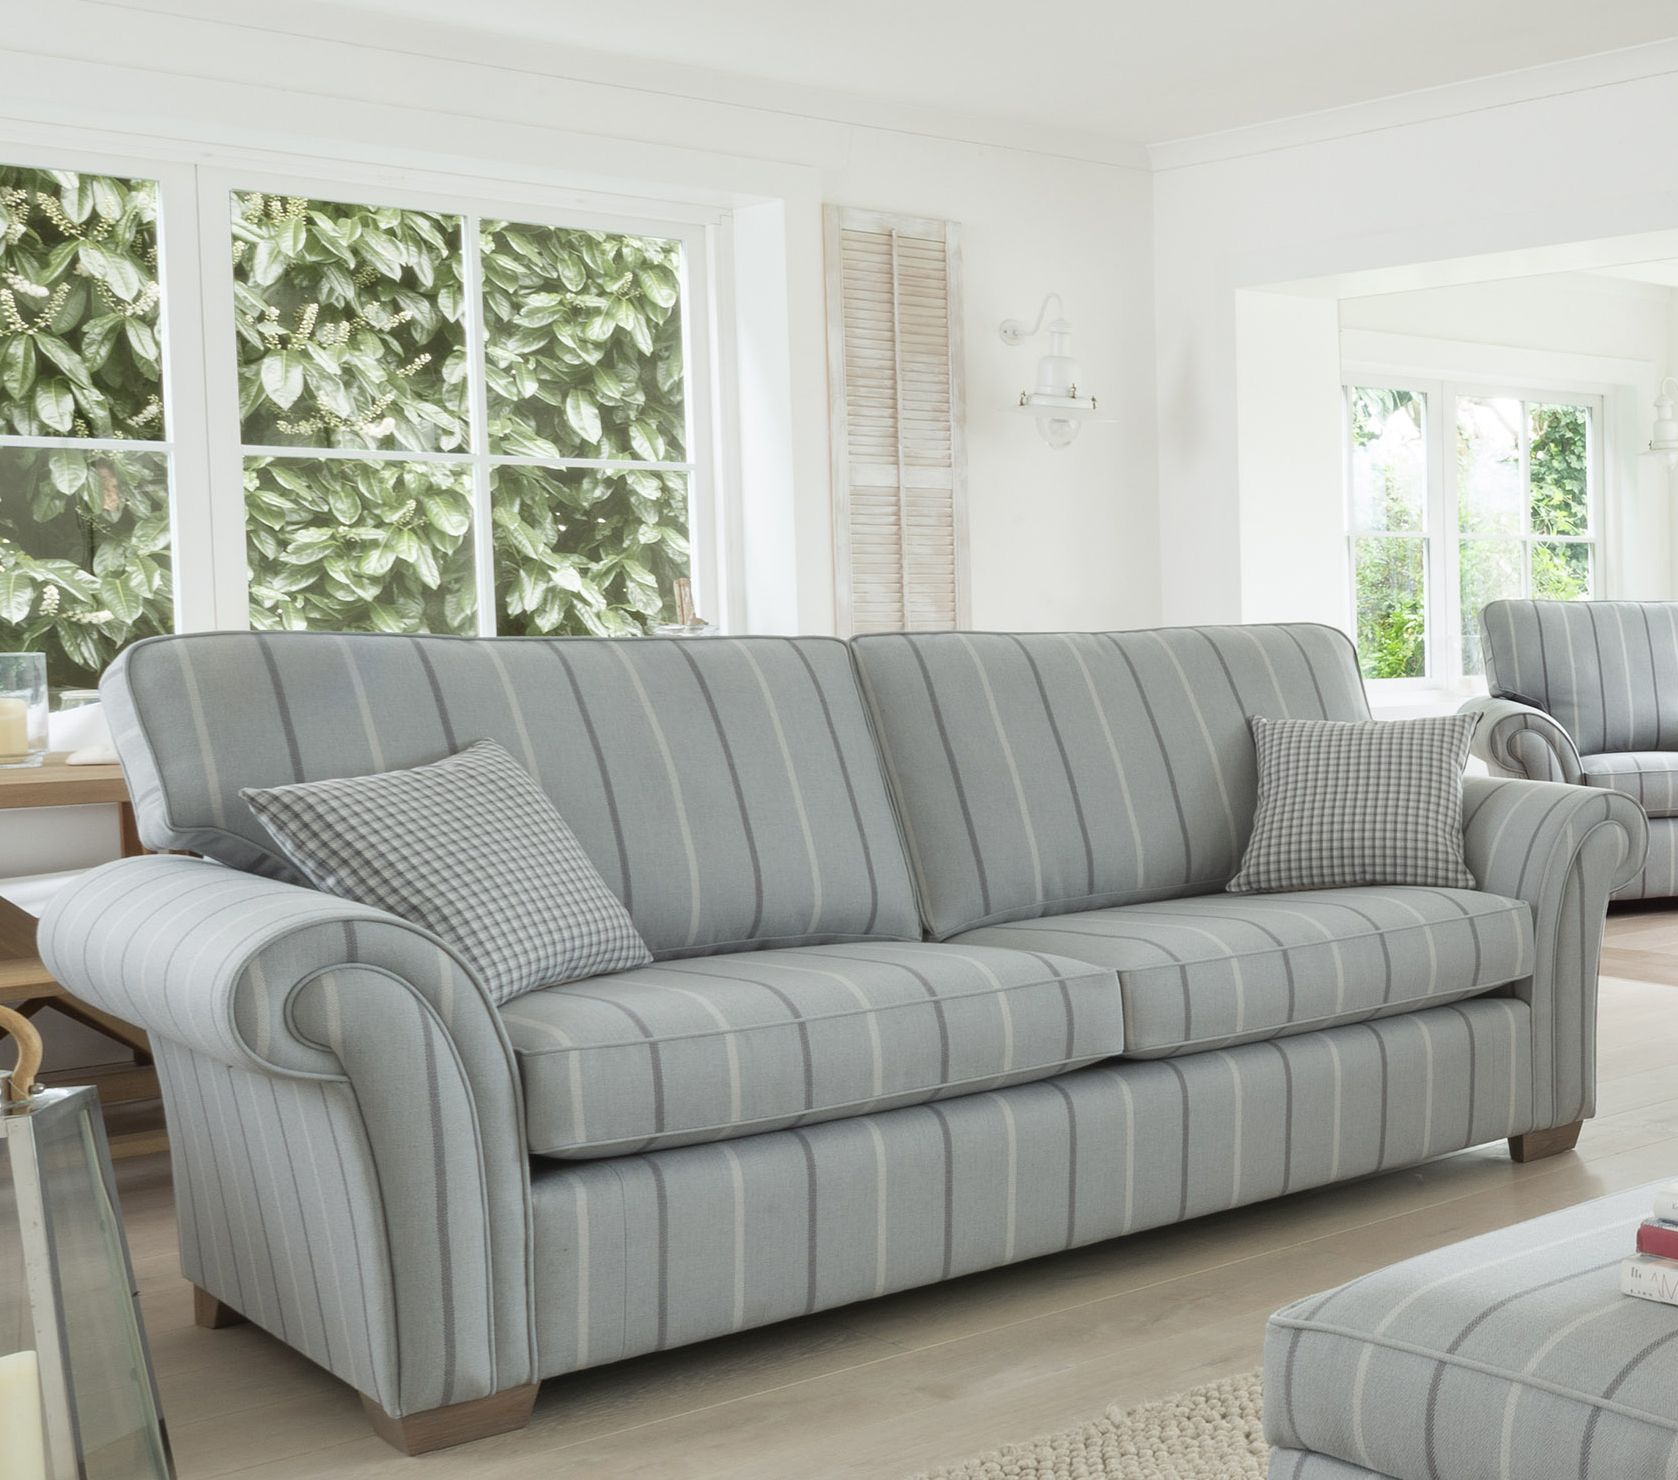 Blakeney 3 Seater Sofa Sofa Seater Sofa Home Decor